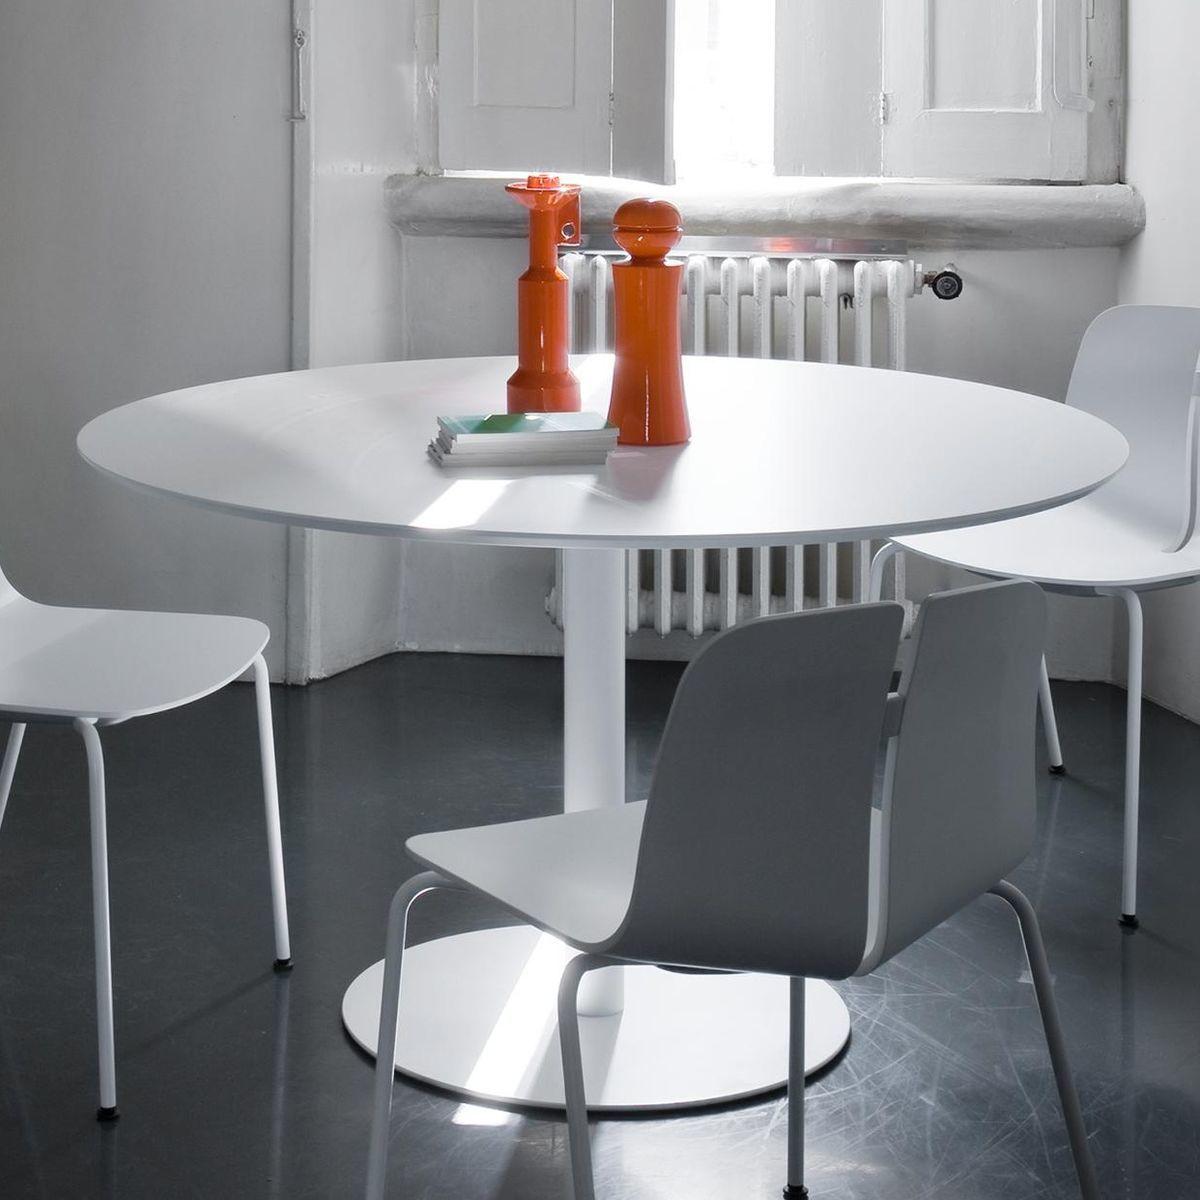 rondo 120 table bistrot la palma. Black Bedroom Furniture Sets. Home Design Ideas